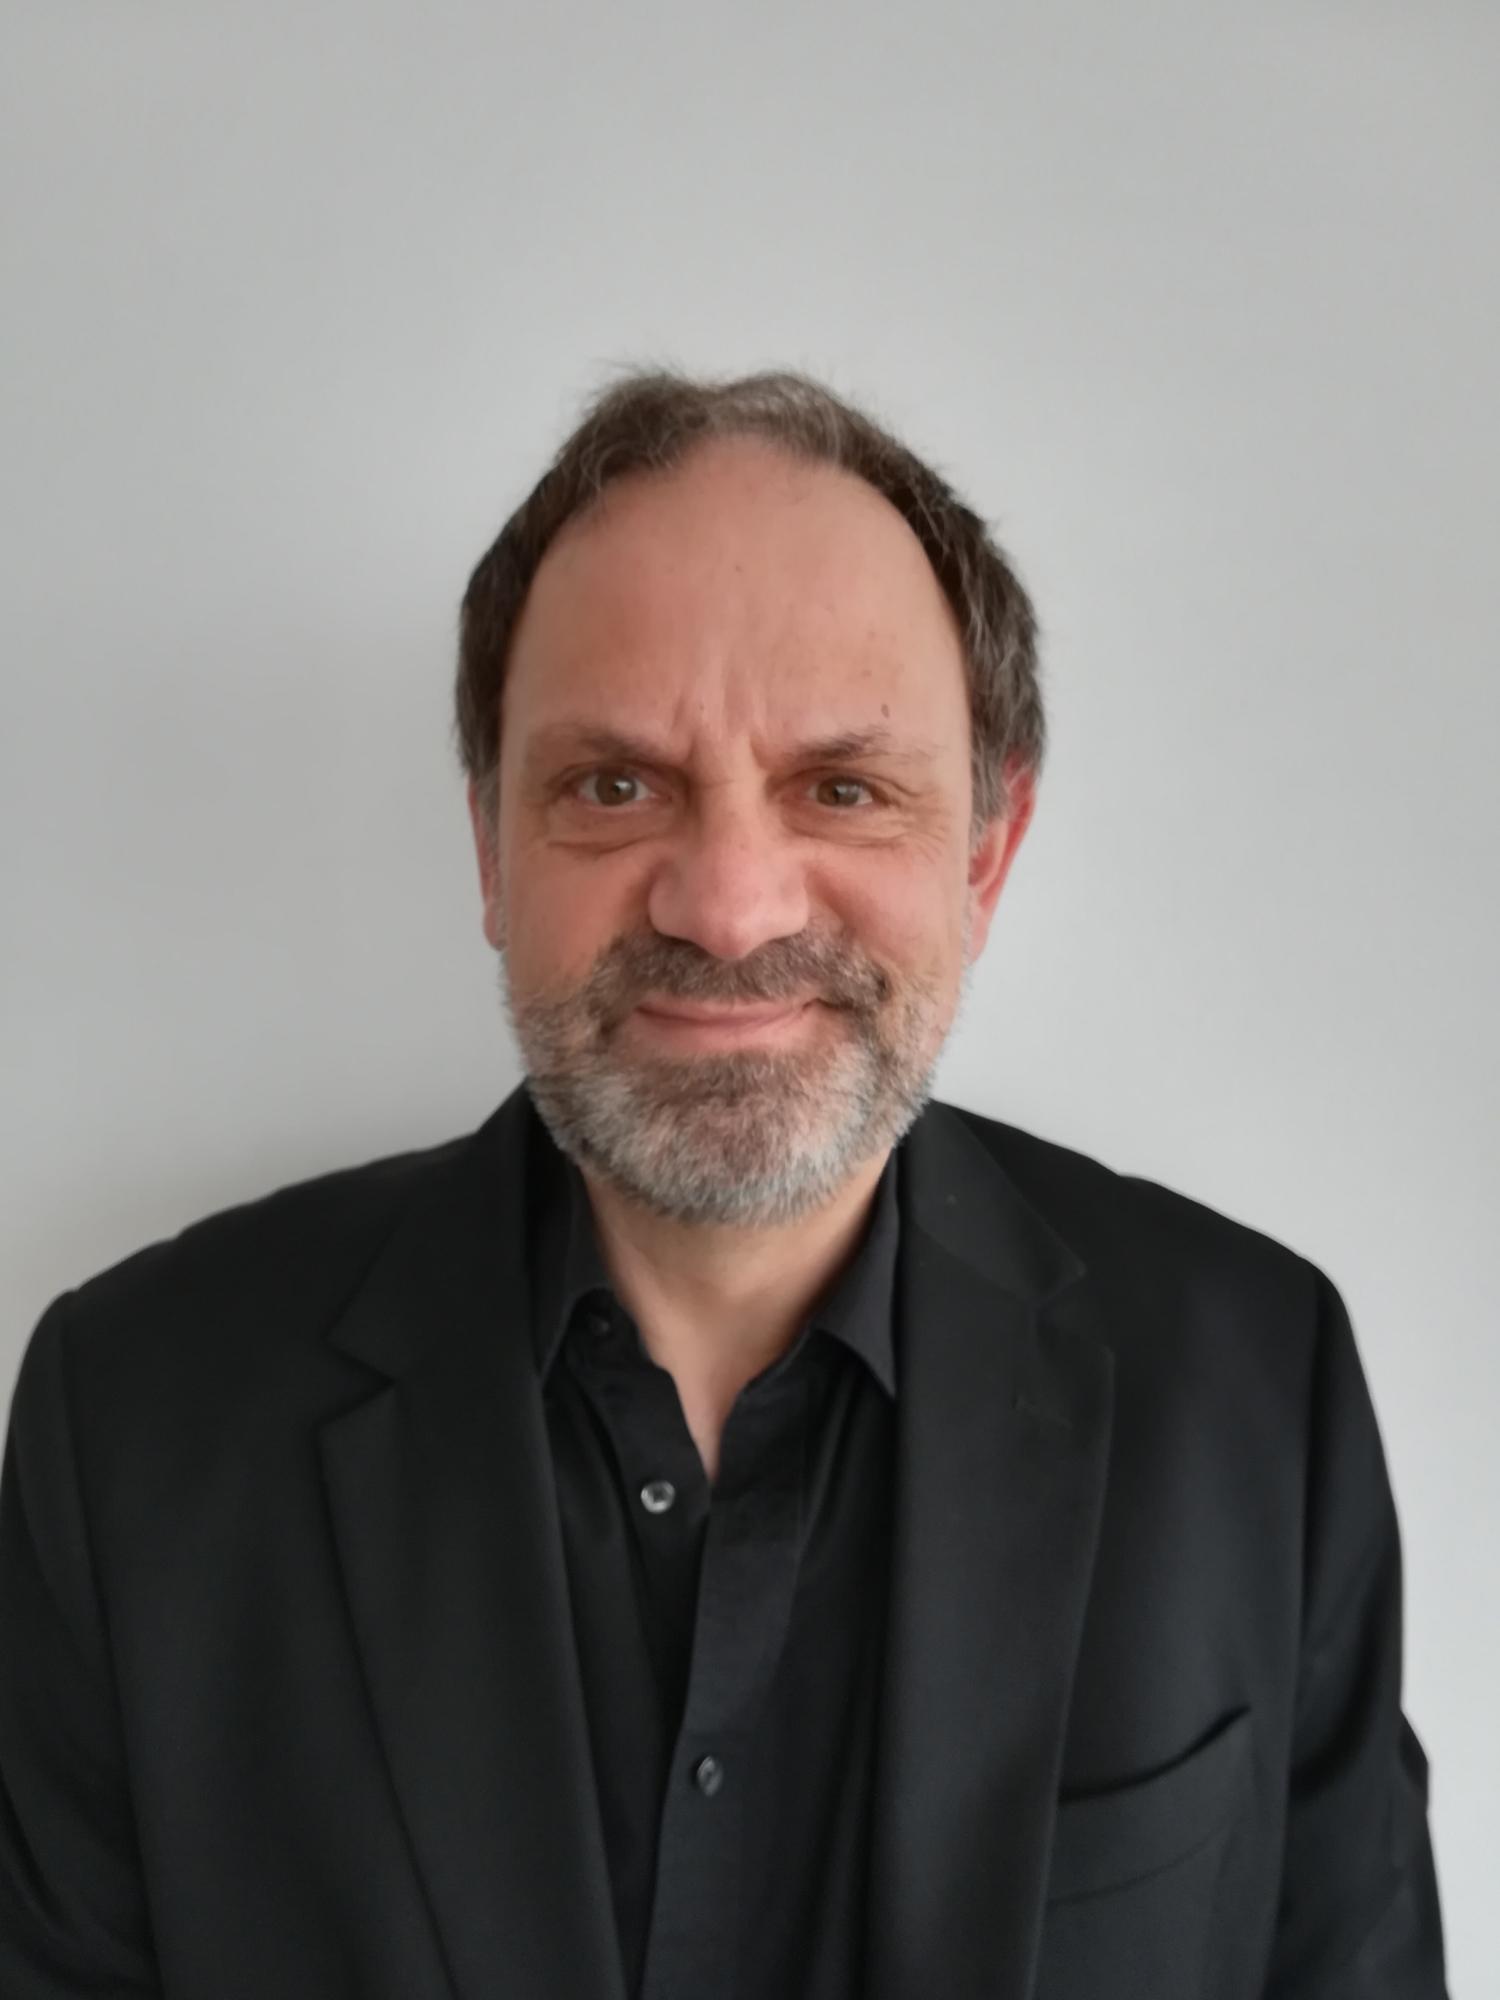 Pfarrer Manfred Wurm